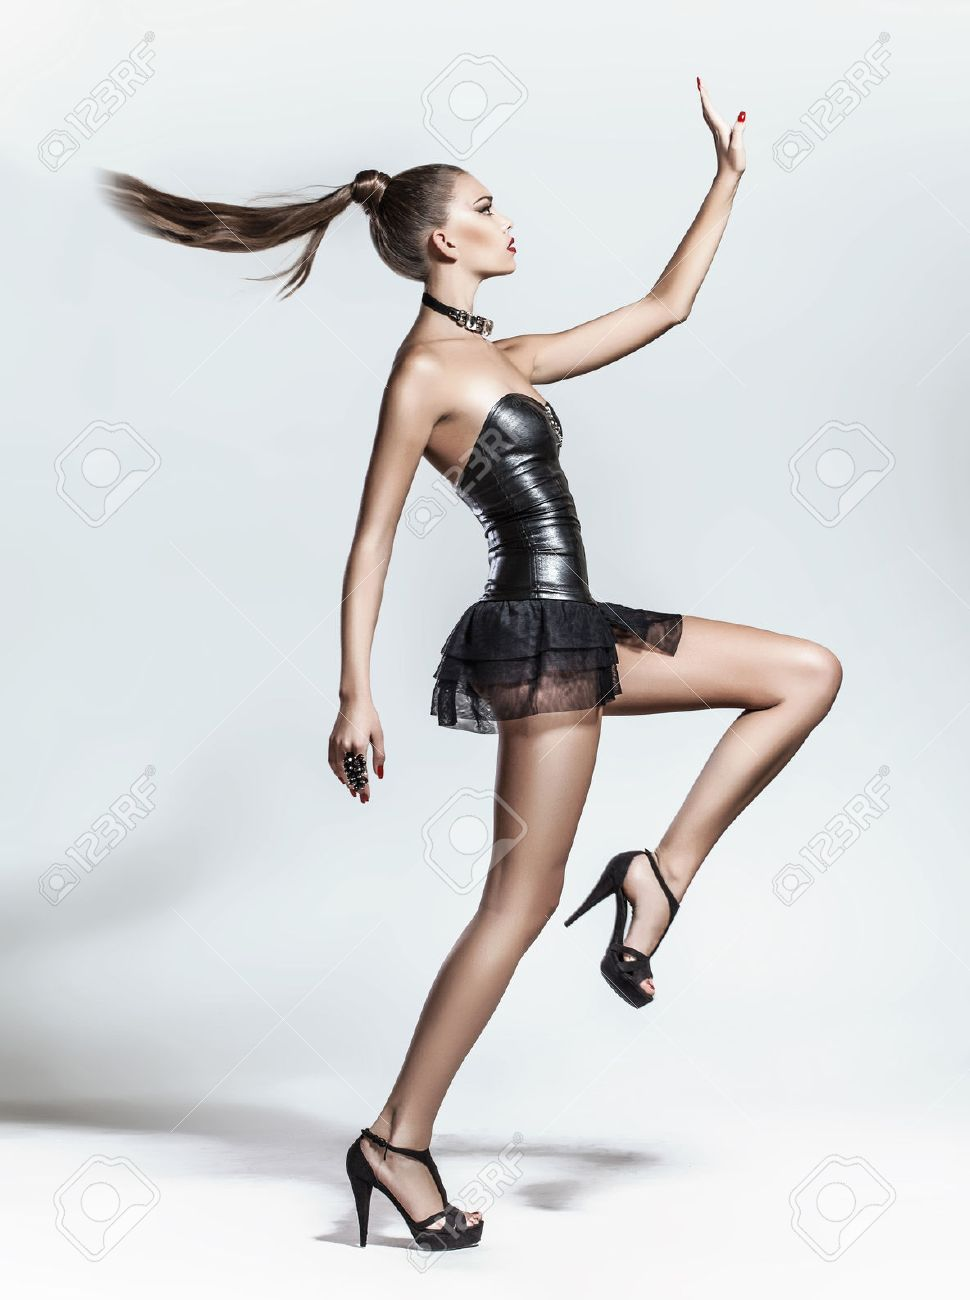 Fashion model posing on white background in the studio Stock Photo - 24368617